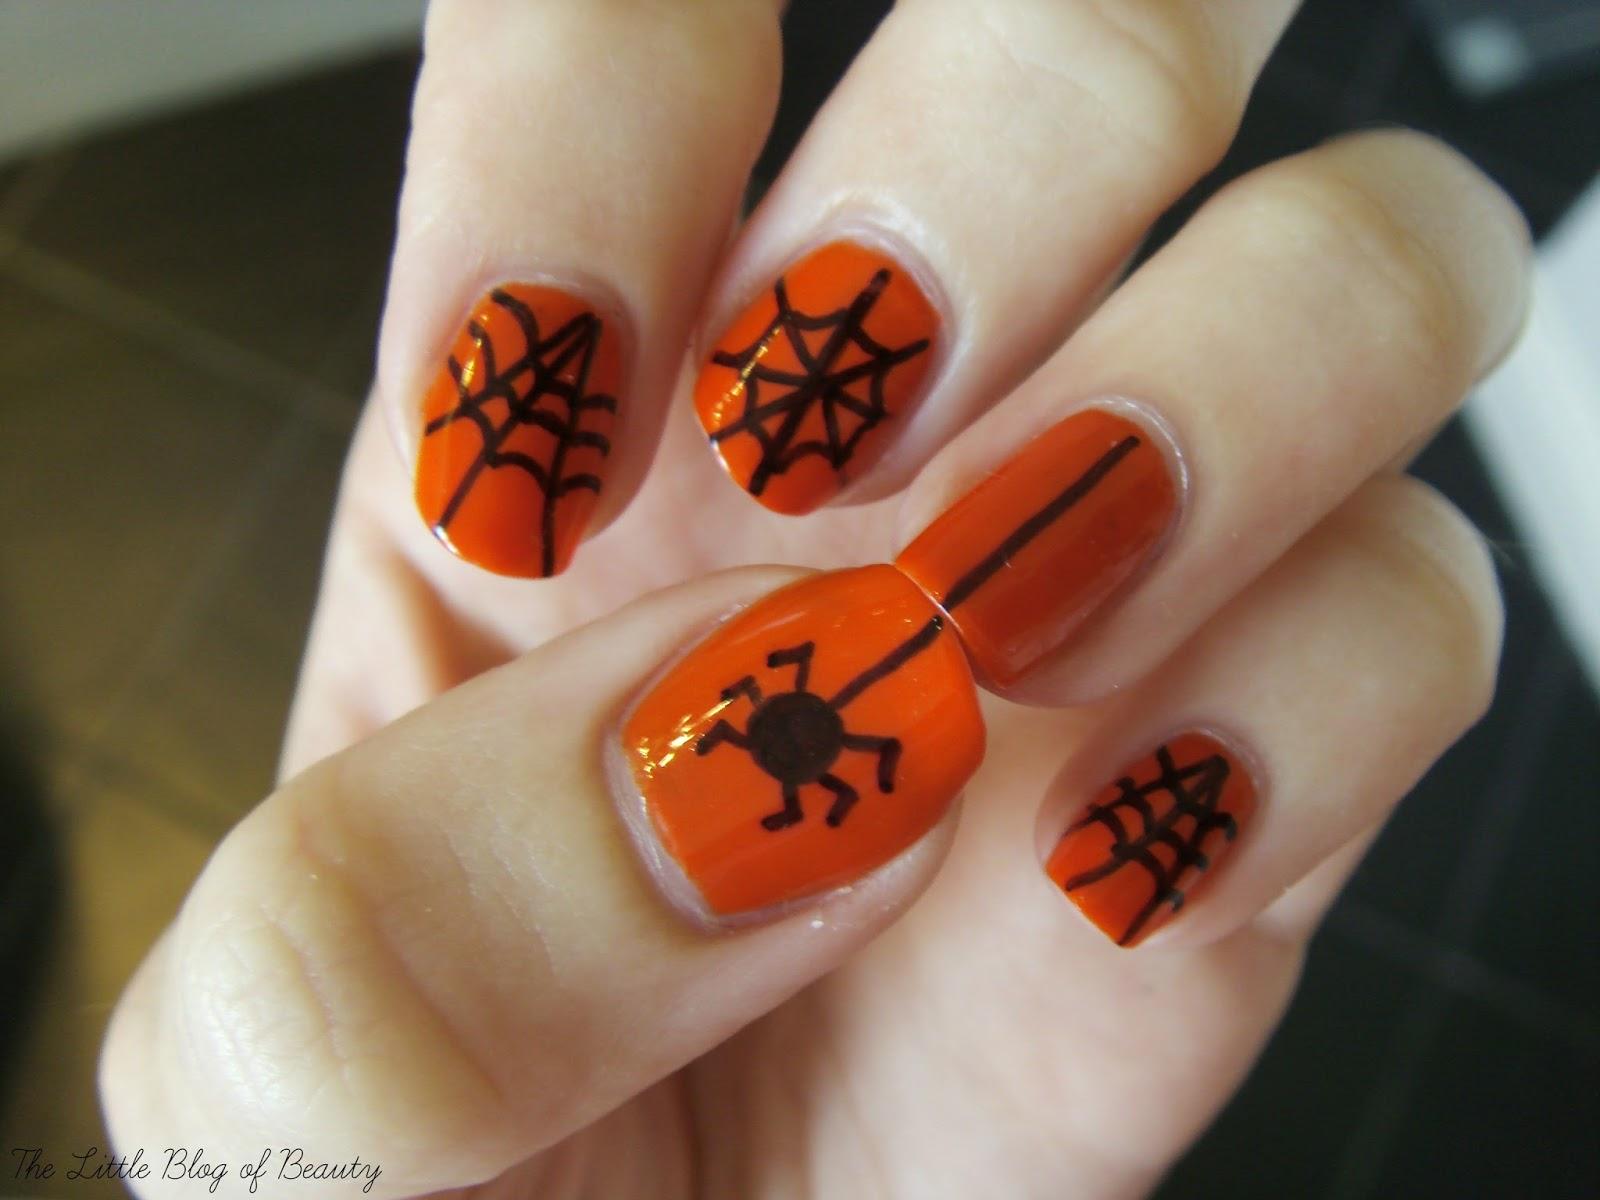 Halloween nail art - Incy wincy